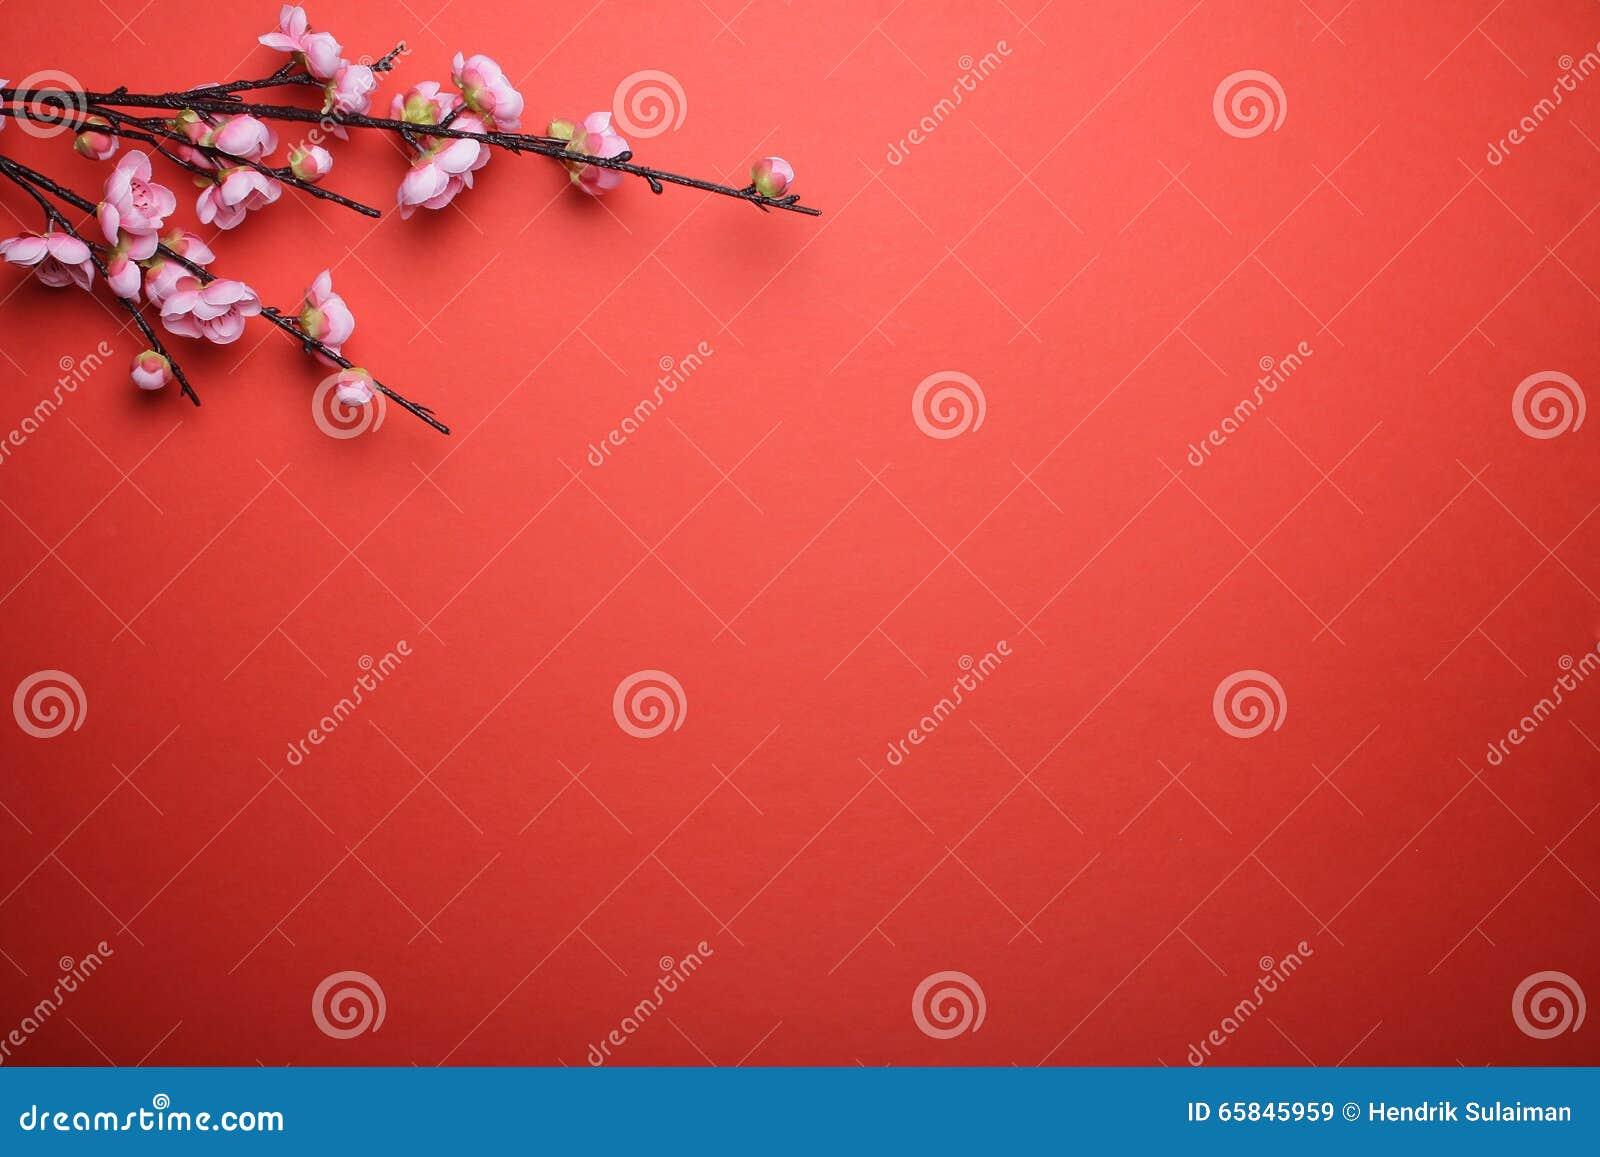 Chinese New Year Background Stock Photo - Image: 65845959